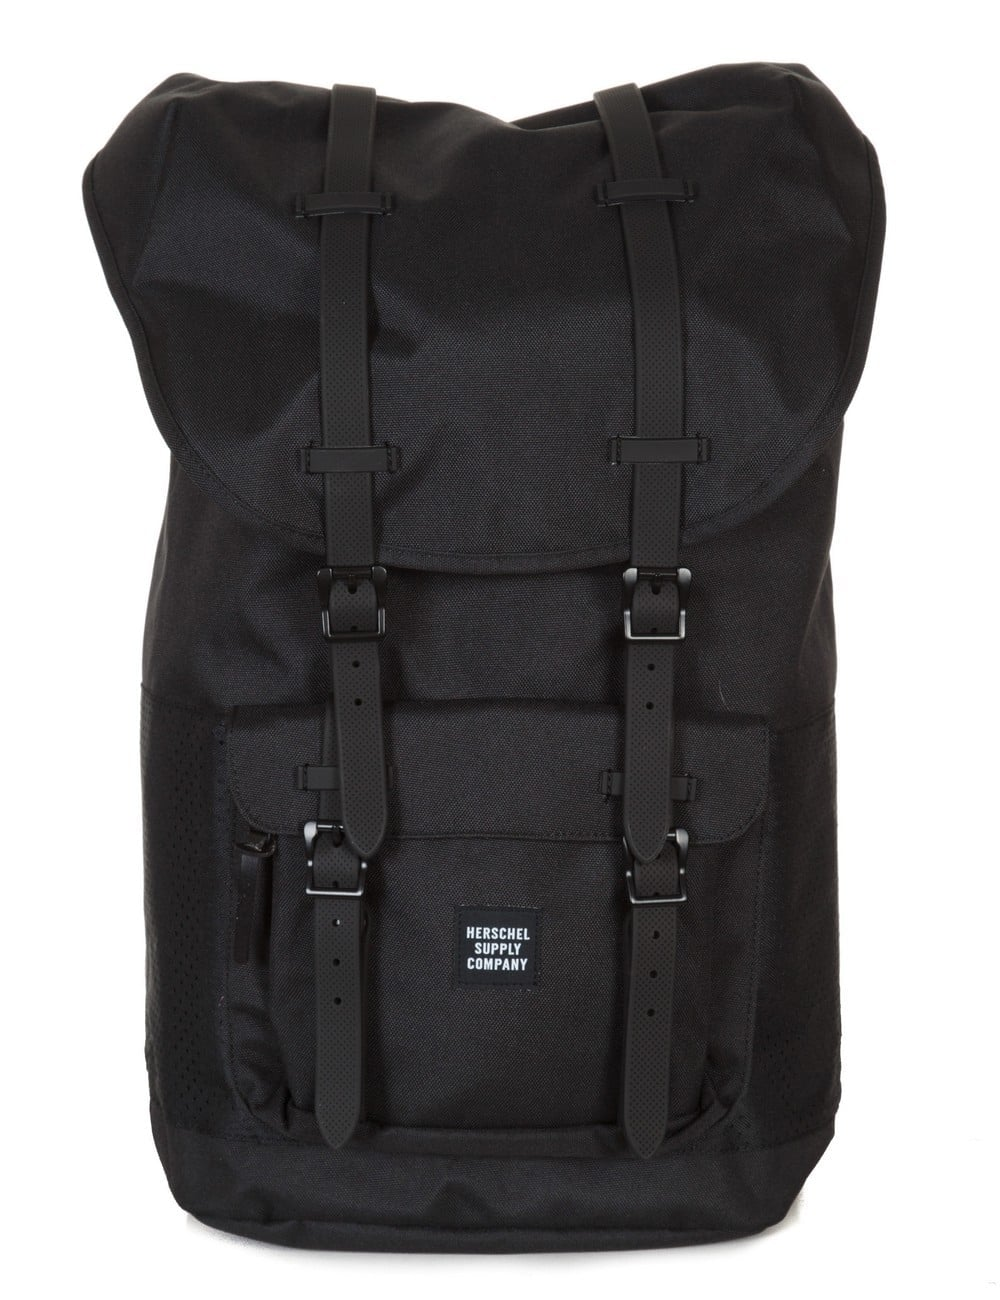 buy official site huge discount Herschel Supply Co Little America 25L Backpack - Black/Black ...